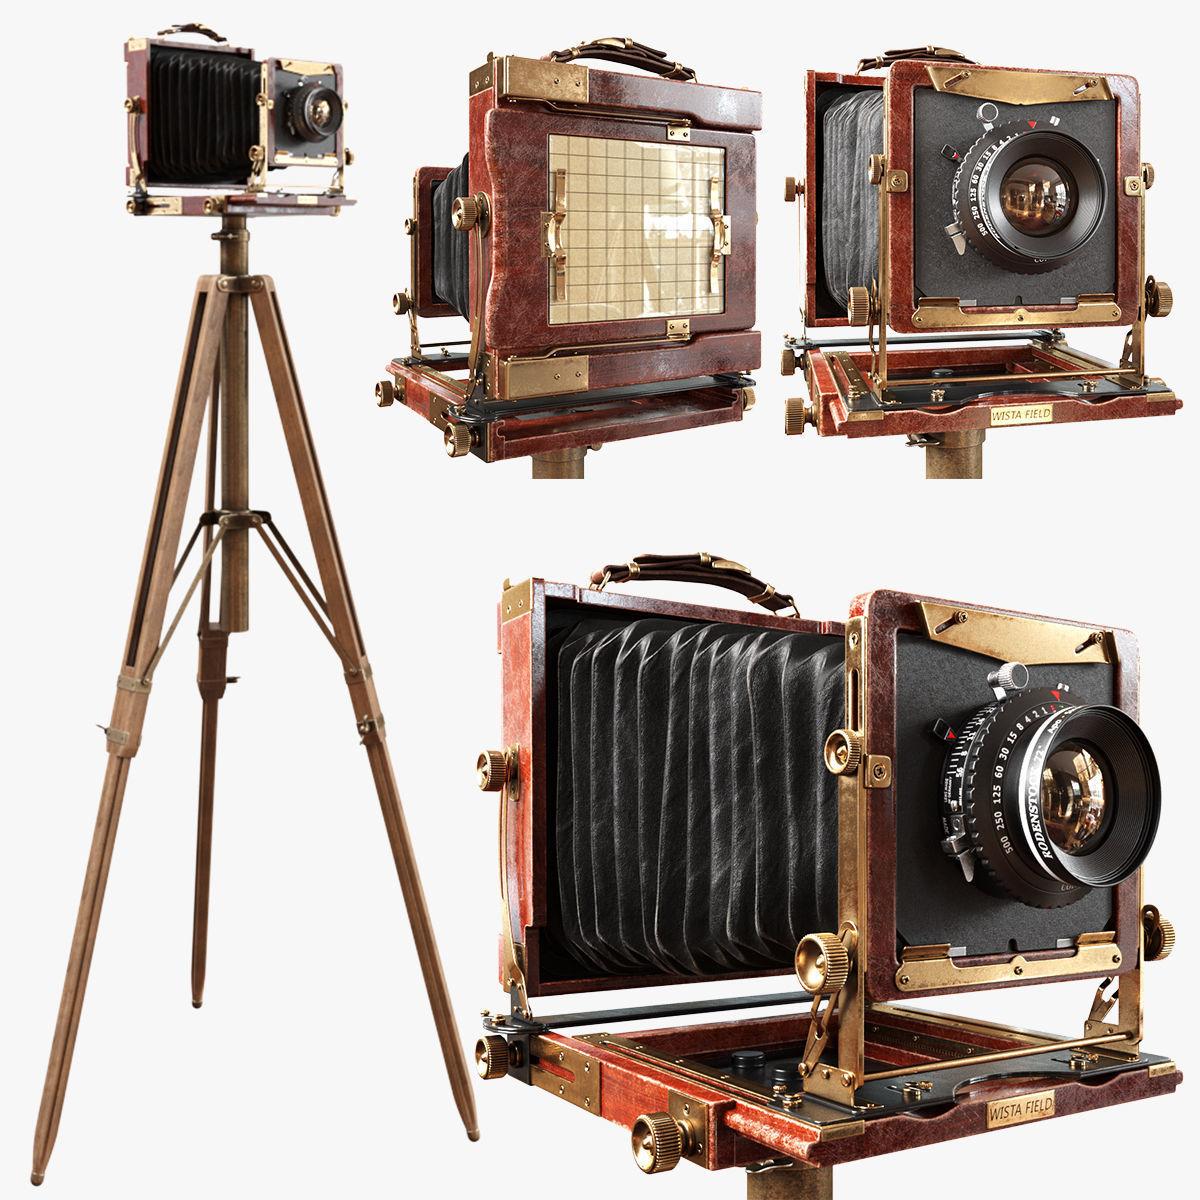 Vintage Wista Field Camera on a Tripod